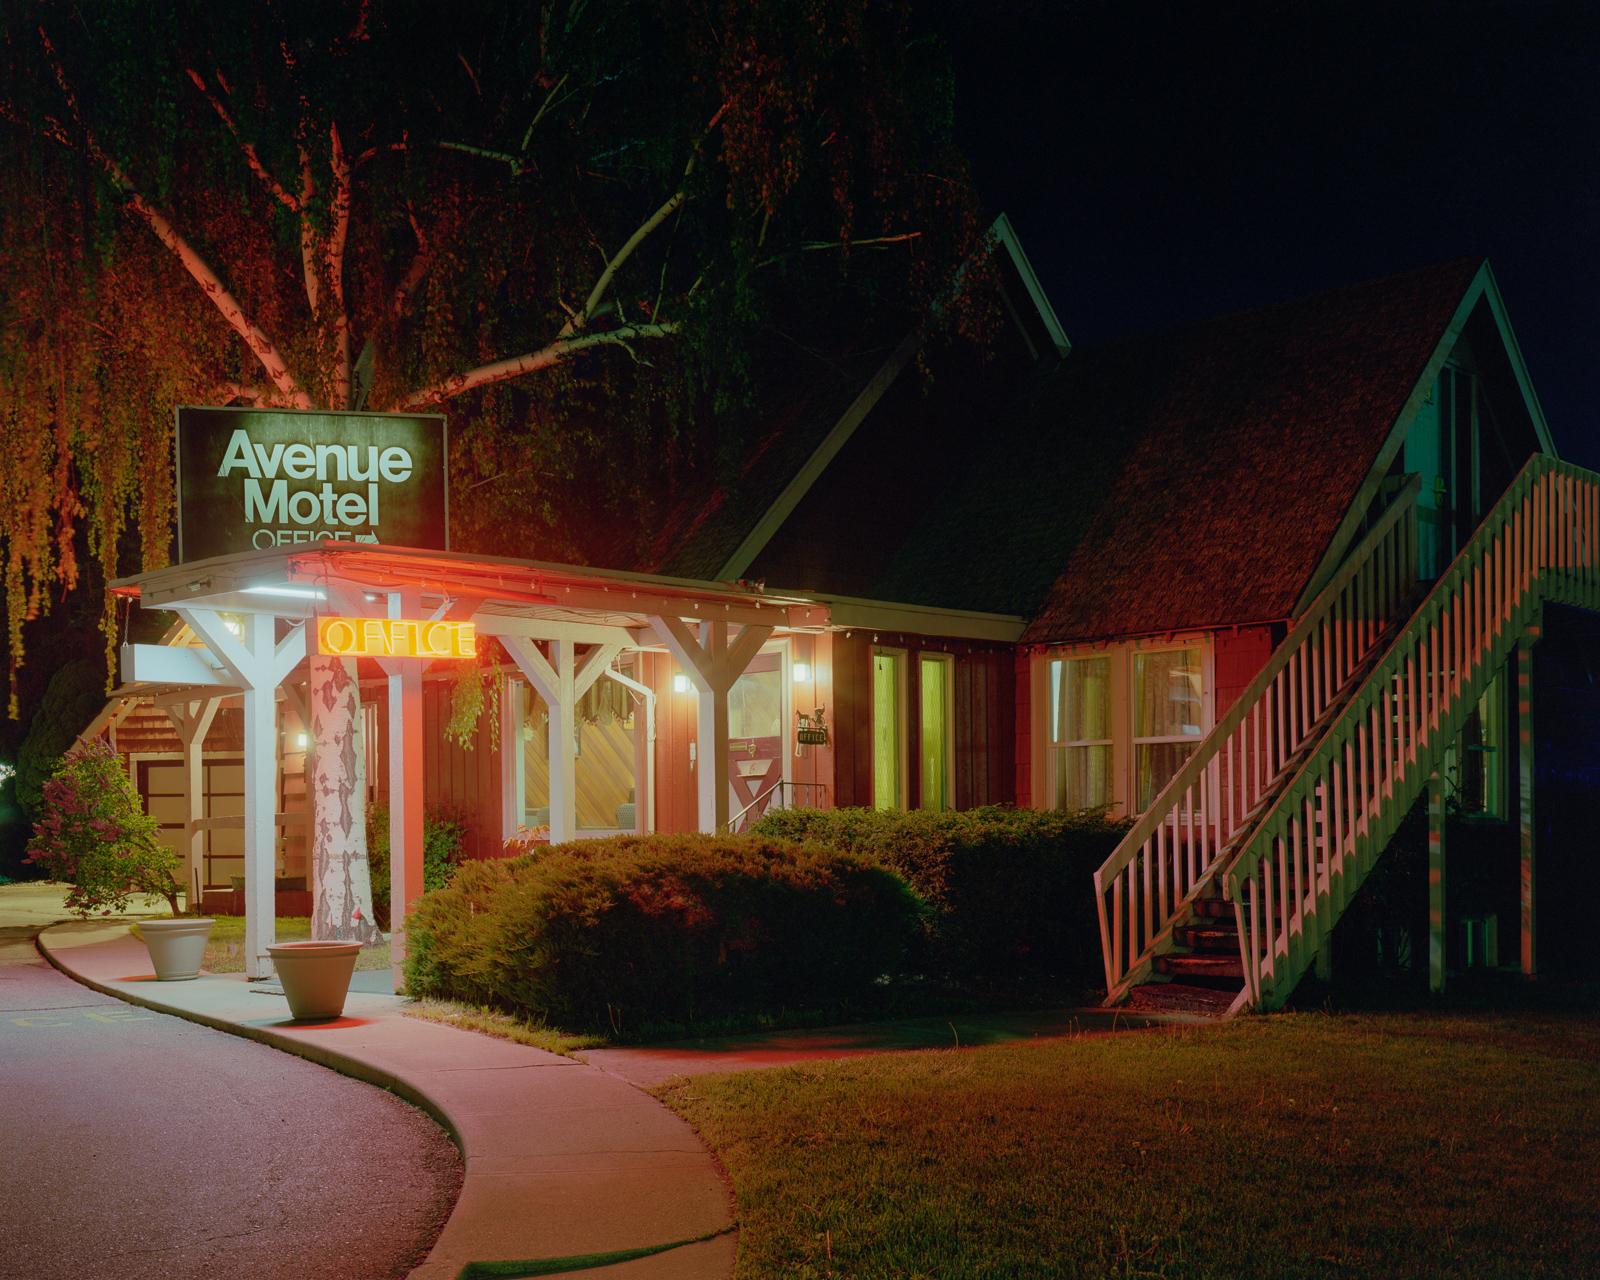 Sfondi notte casa leggero architettura zona residenziale